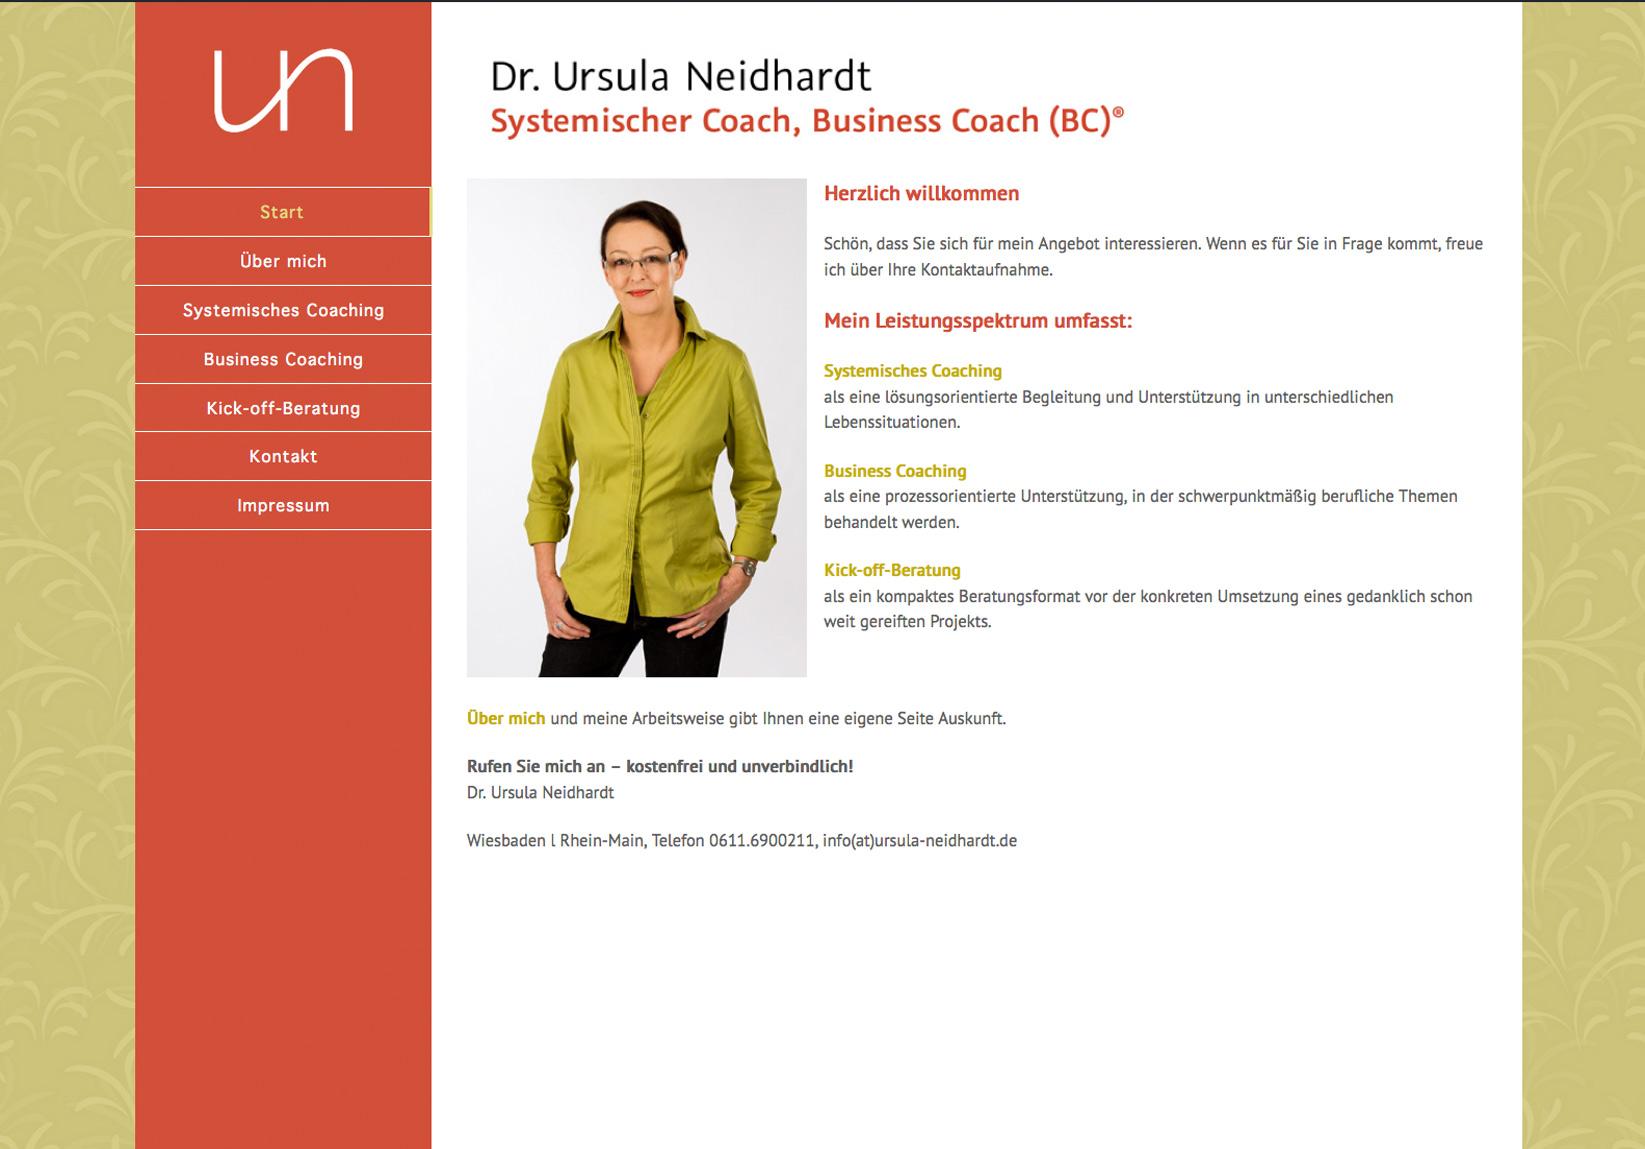 Dr. Ursula Neidhardt